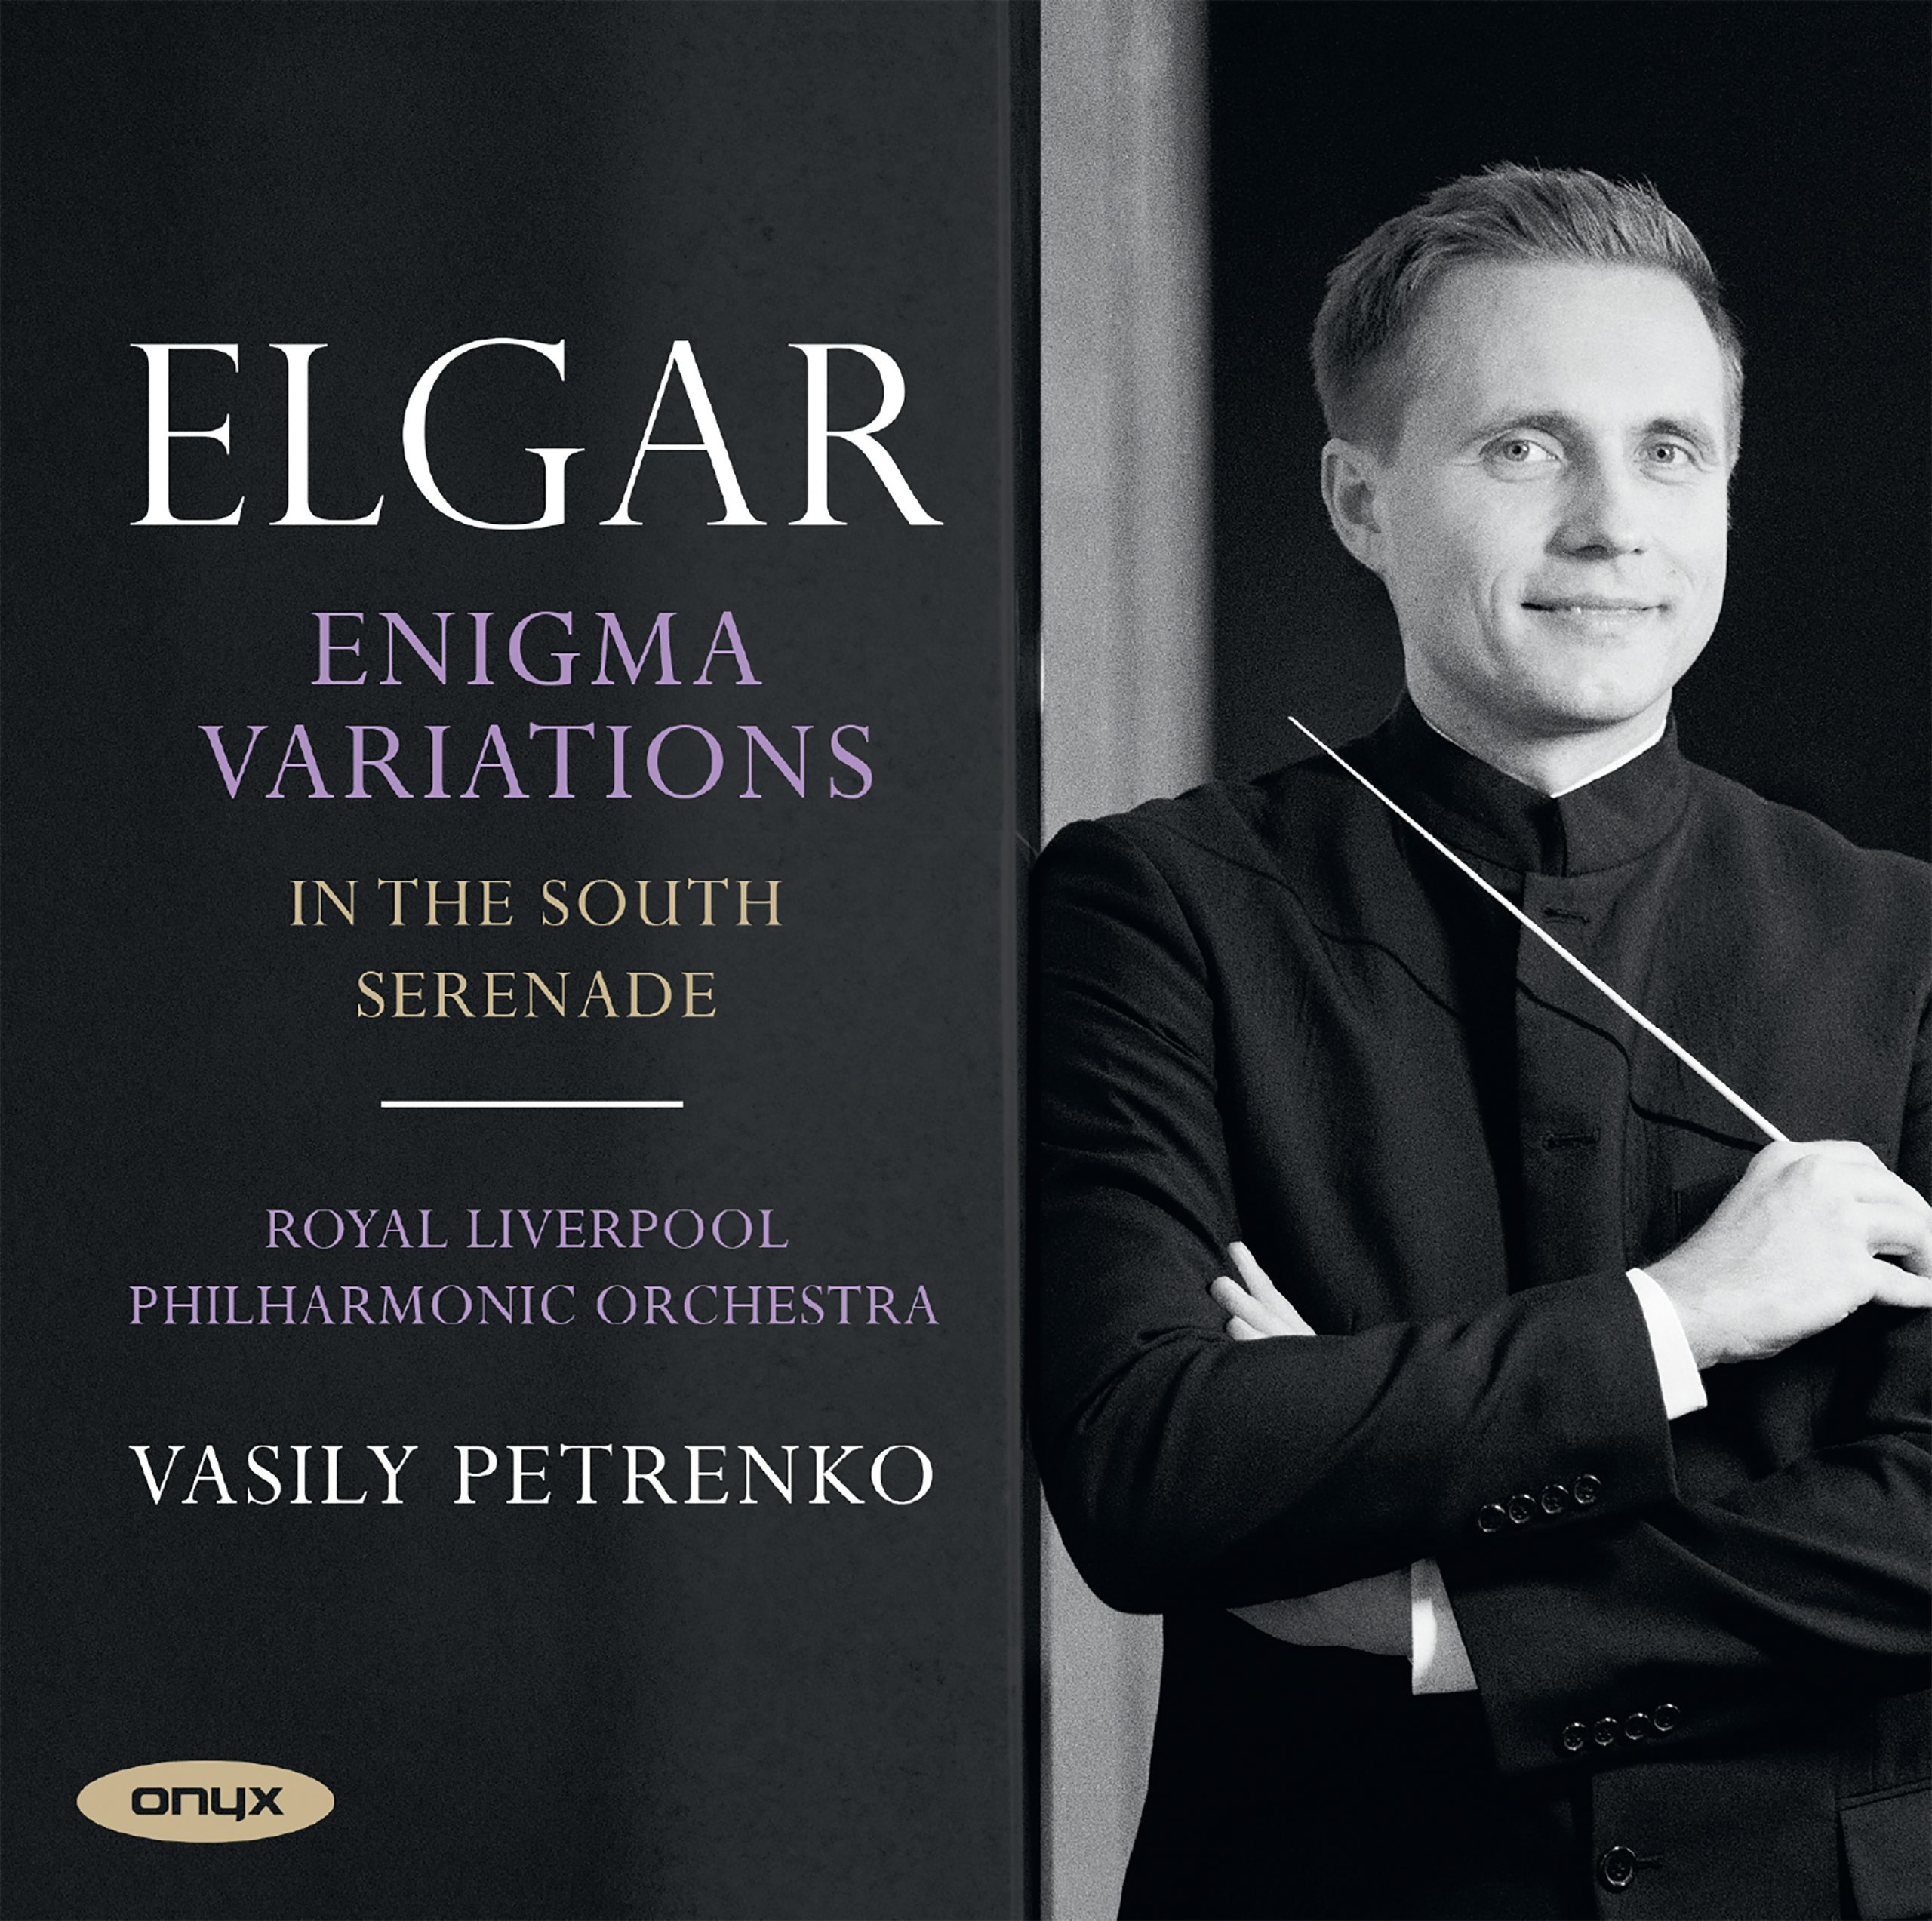 Elgar: Enigma Variations; In the South; Serenade for Strings